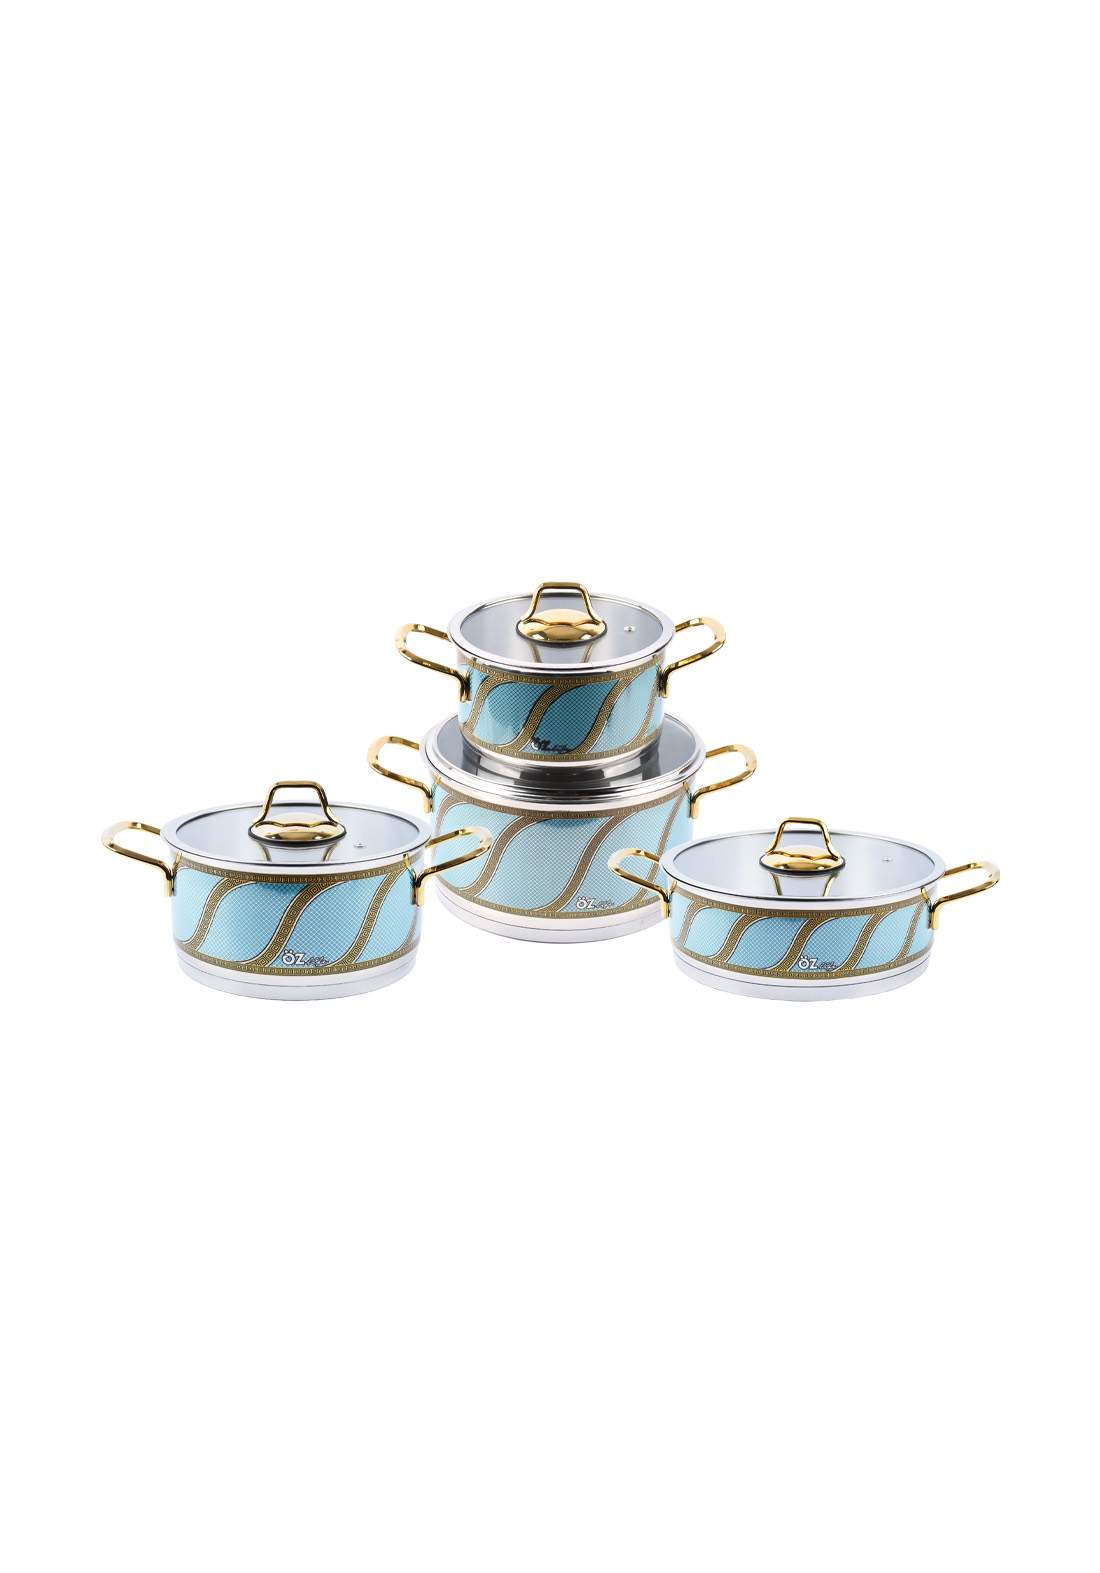 Ozlife Cookware Set Decorated Turquoise  8 Piece سيت  قدور ستيل ملون